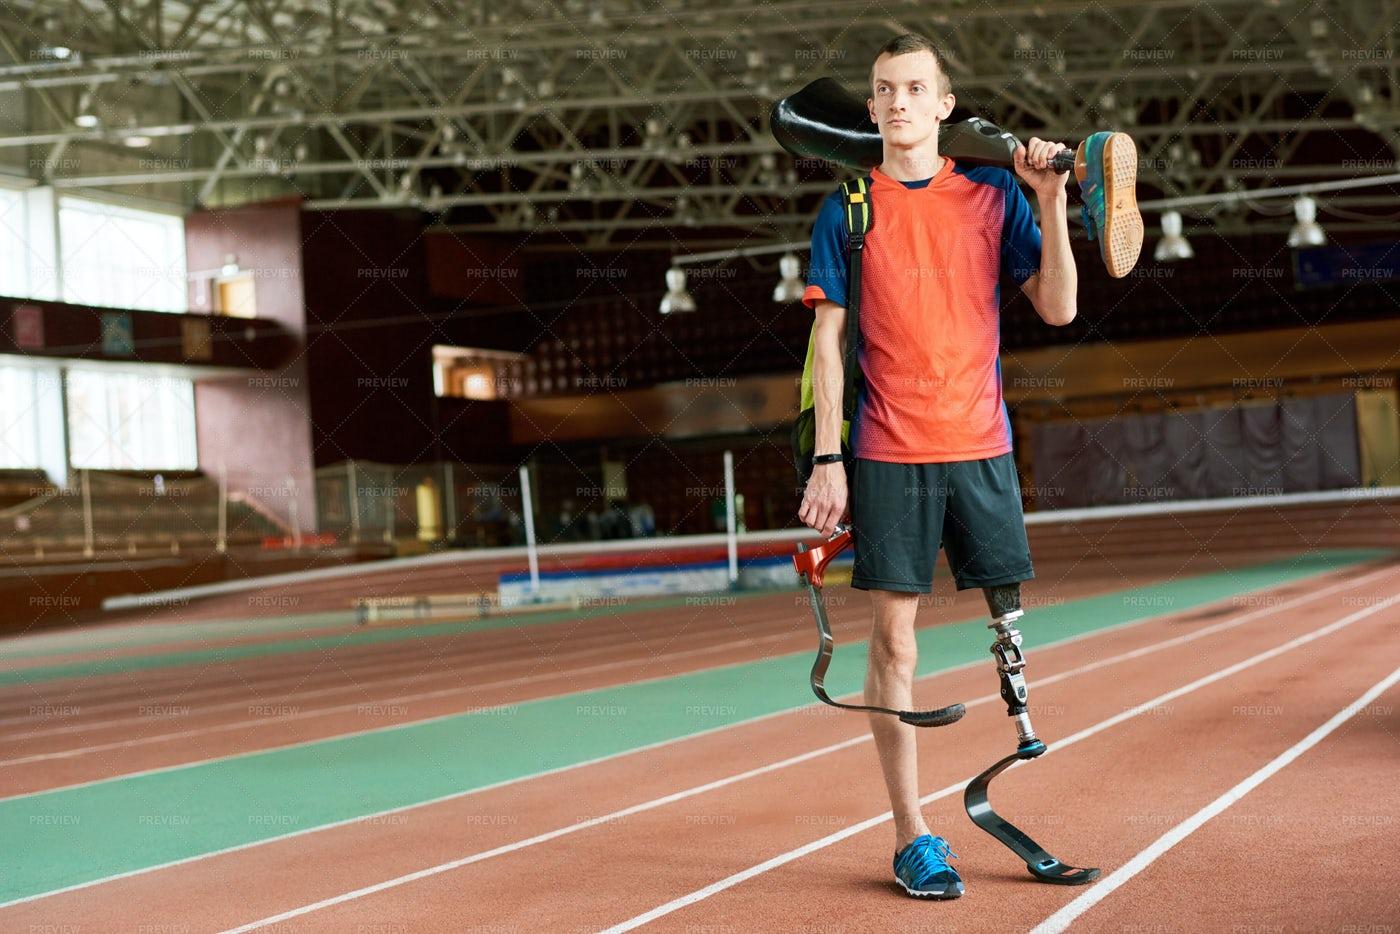 Handicapped Sportsman Holding Leg...: Stock Photos